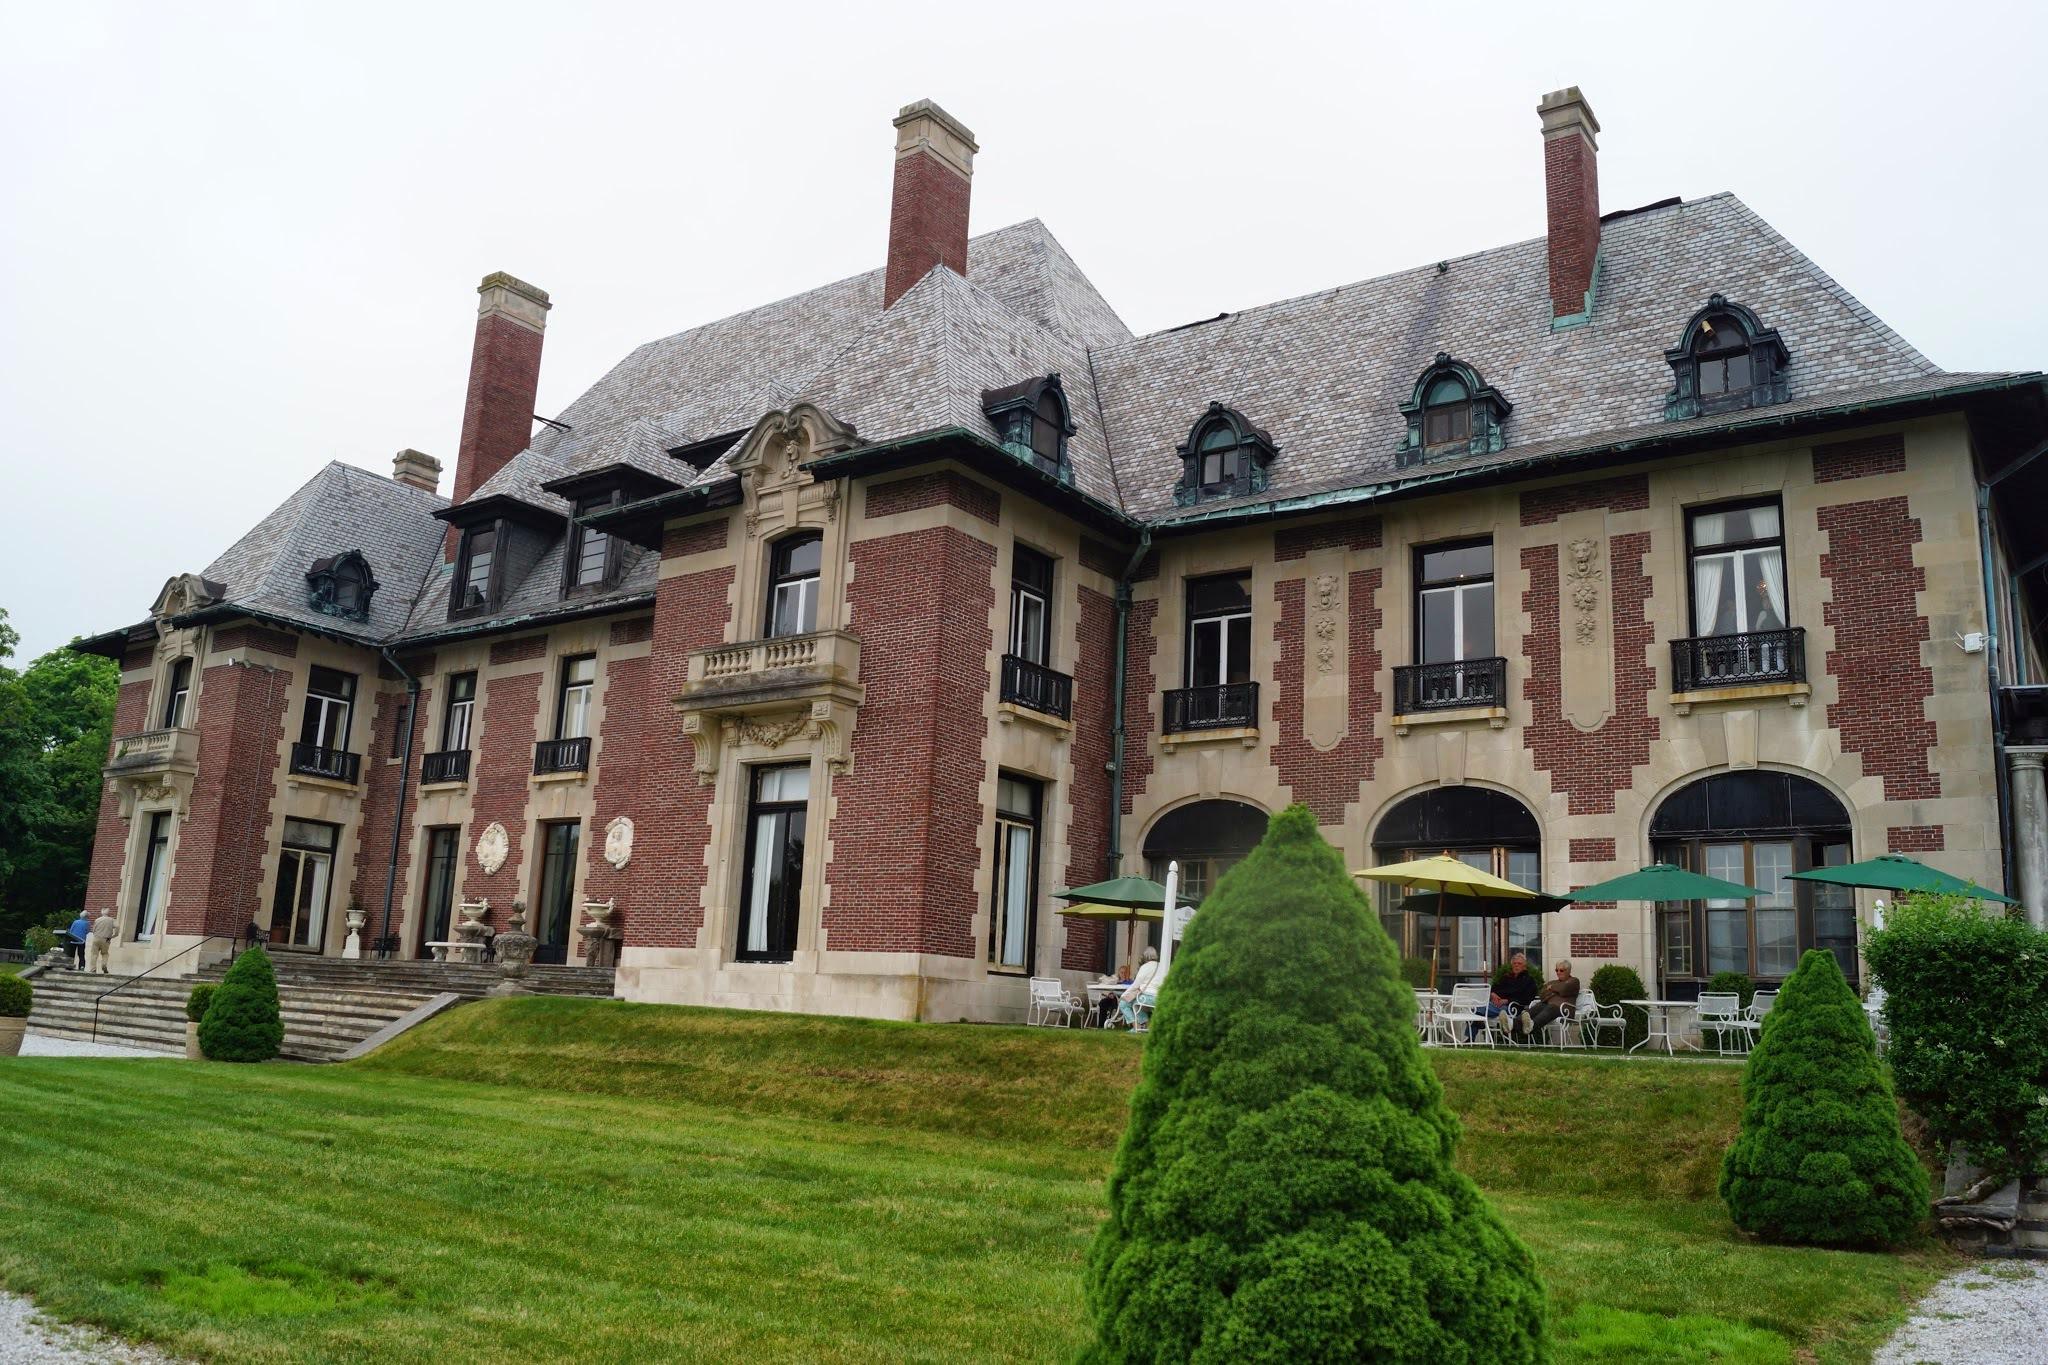 Singles in peapack gladstone nj 12 HIGHLAND Avenue Peapack Gladstone New Jersey Single Family Home for Sale